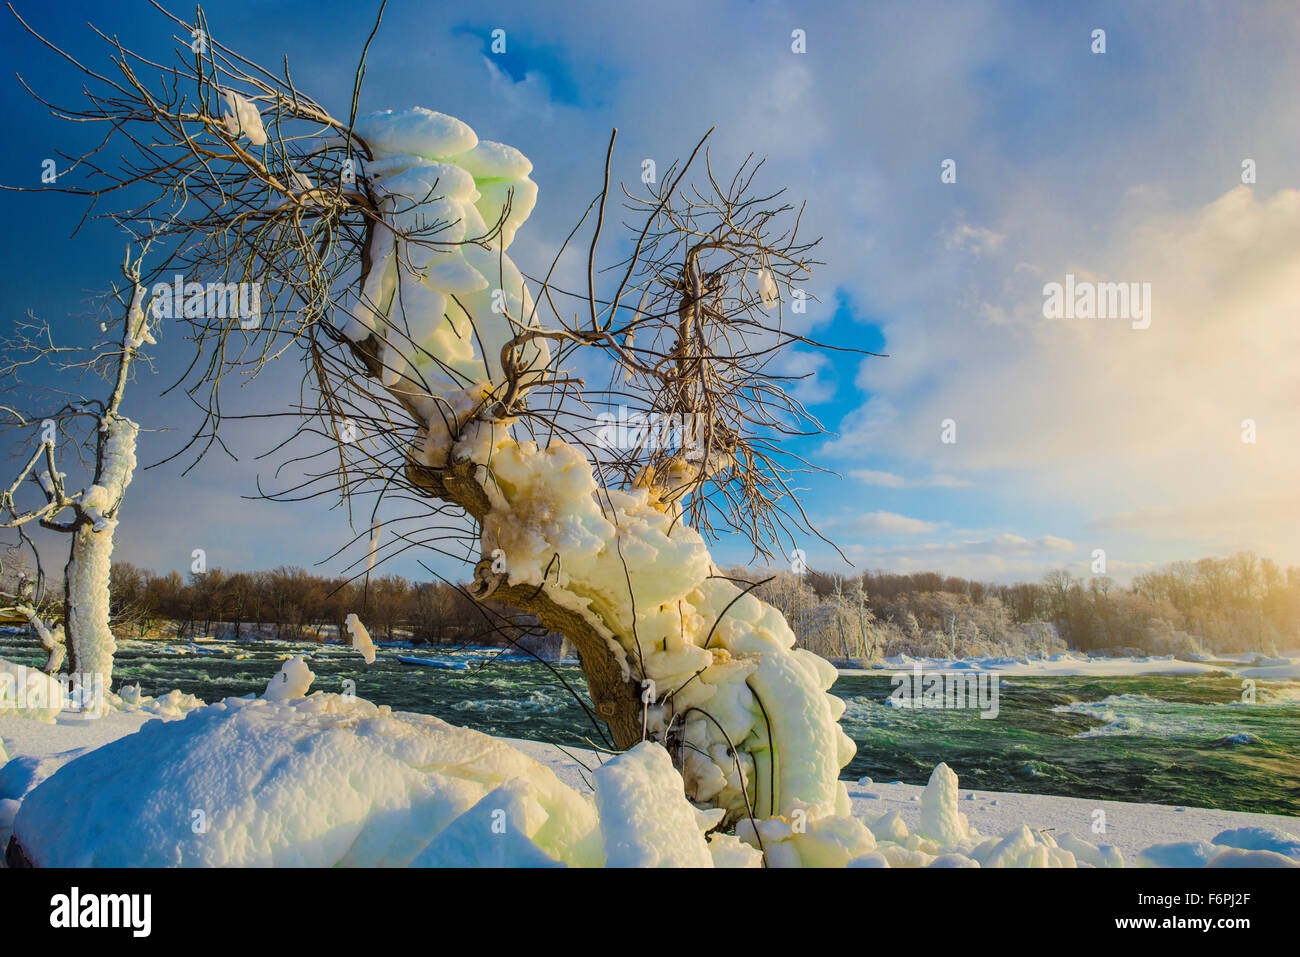 Haken an den Niagarafällen in Winter, Niagara Falls State Park, New York, American Falls vereist Stockbild